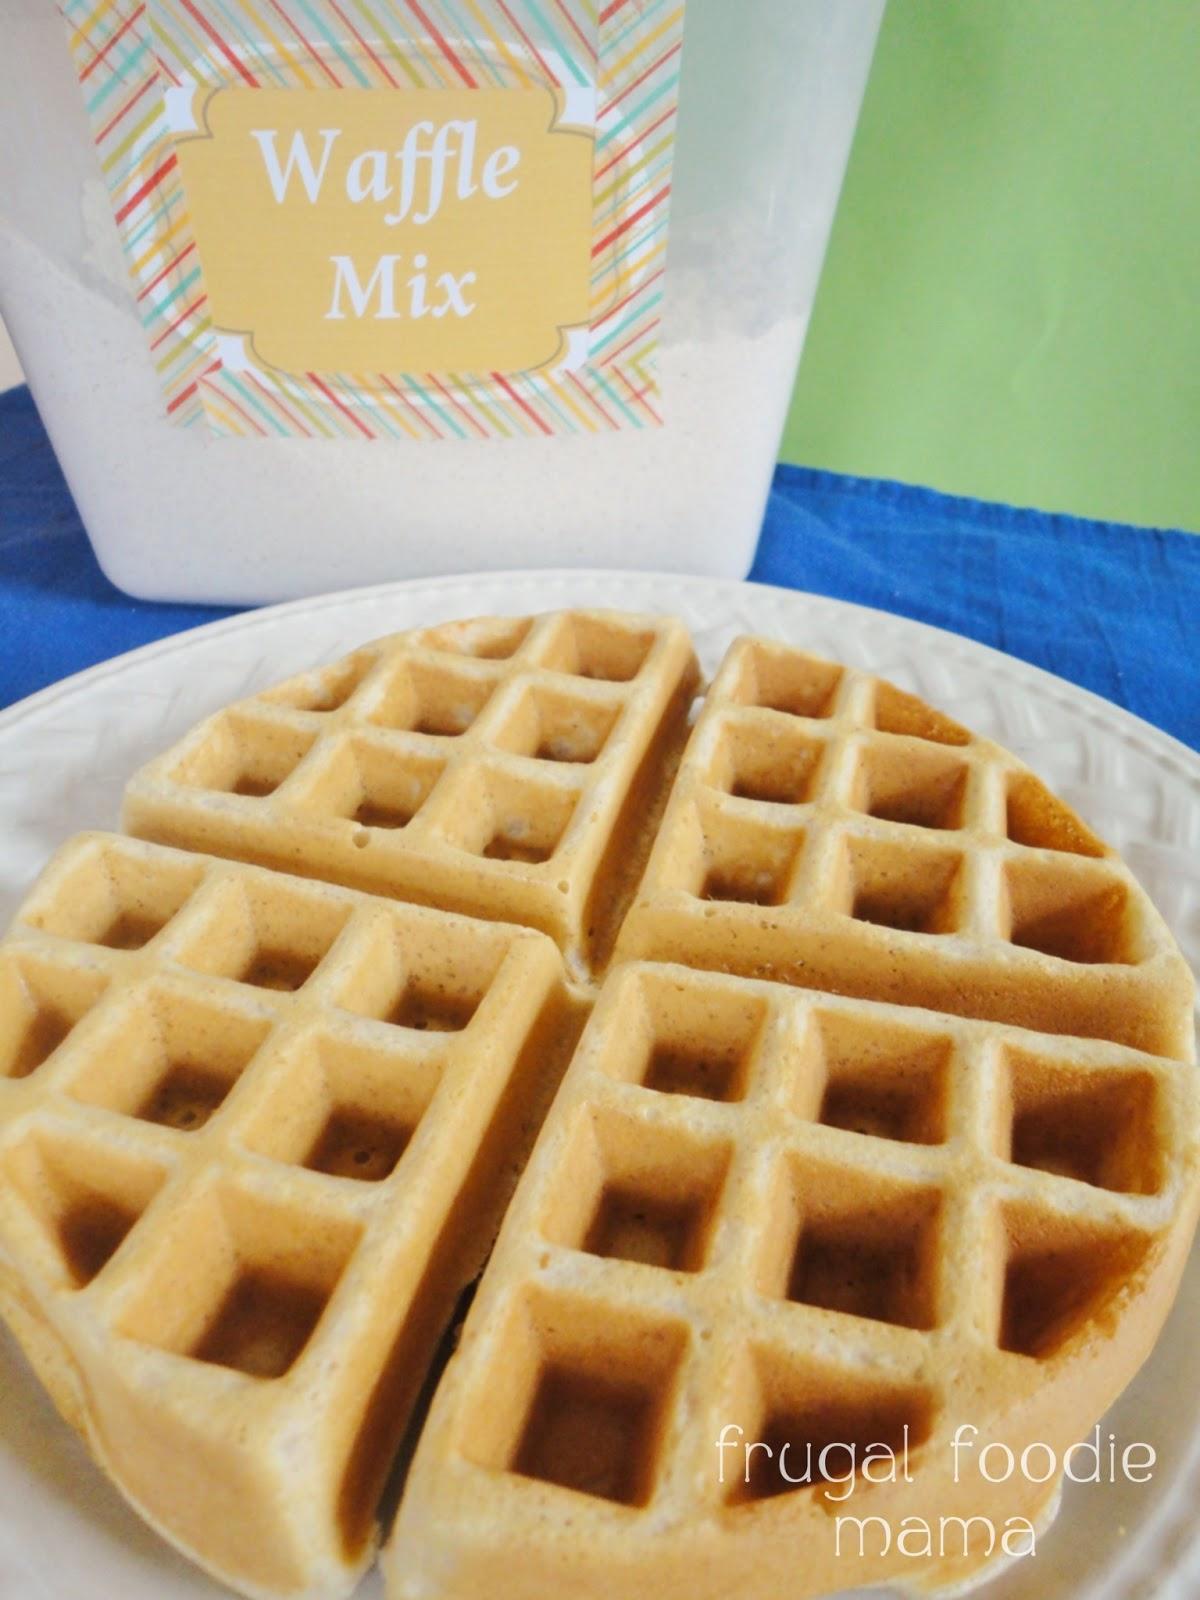 Frugal Foodie Mama: Homemade Belgian Waffle Mix